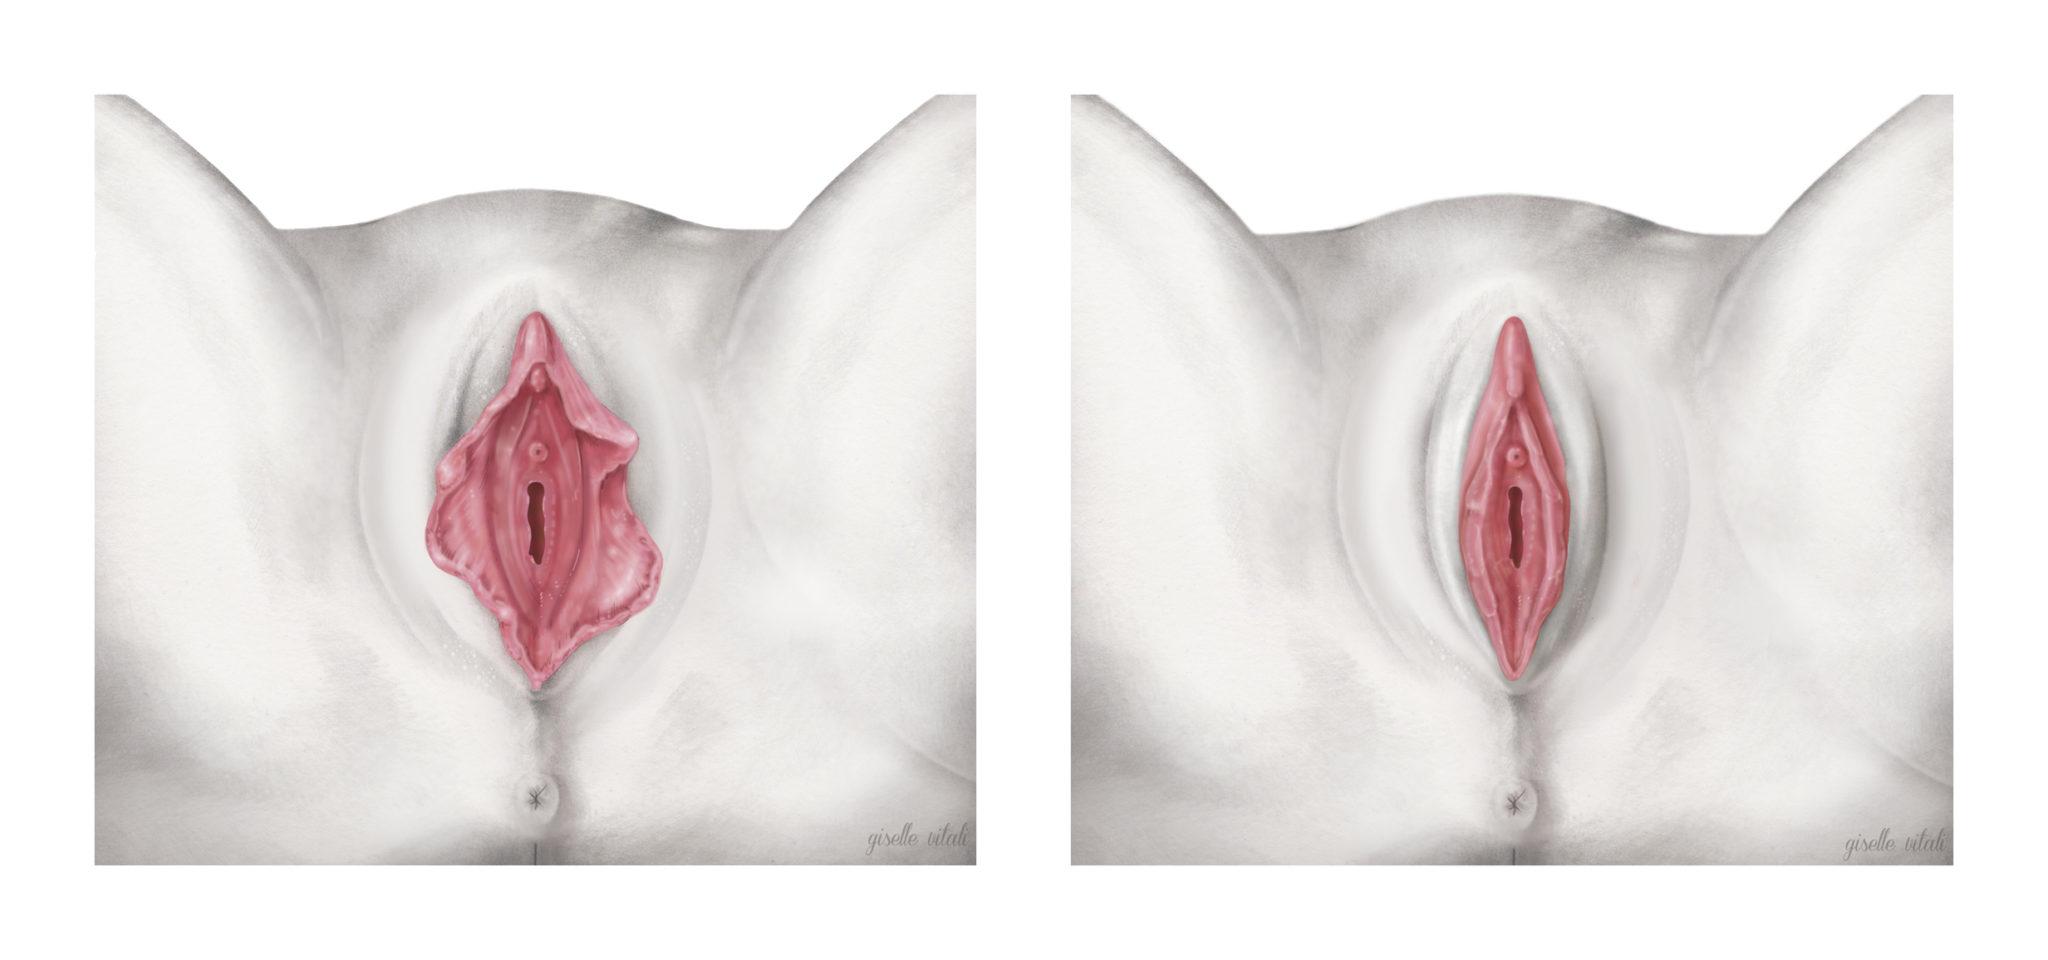 labioplastia ilustracion medica